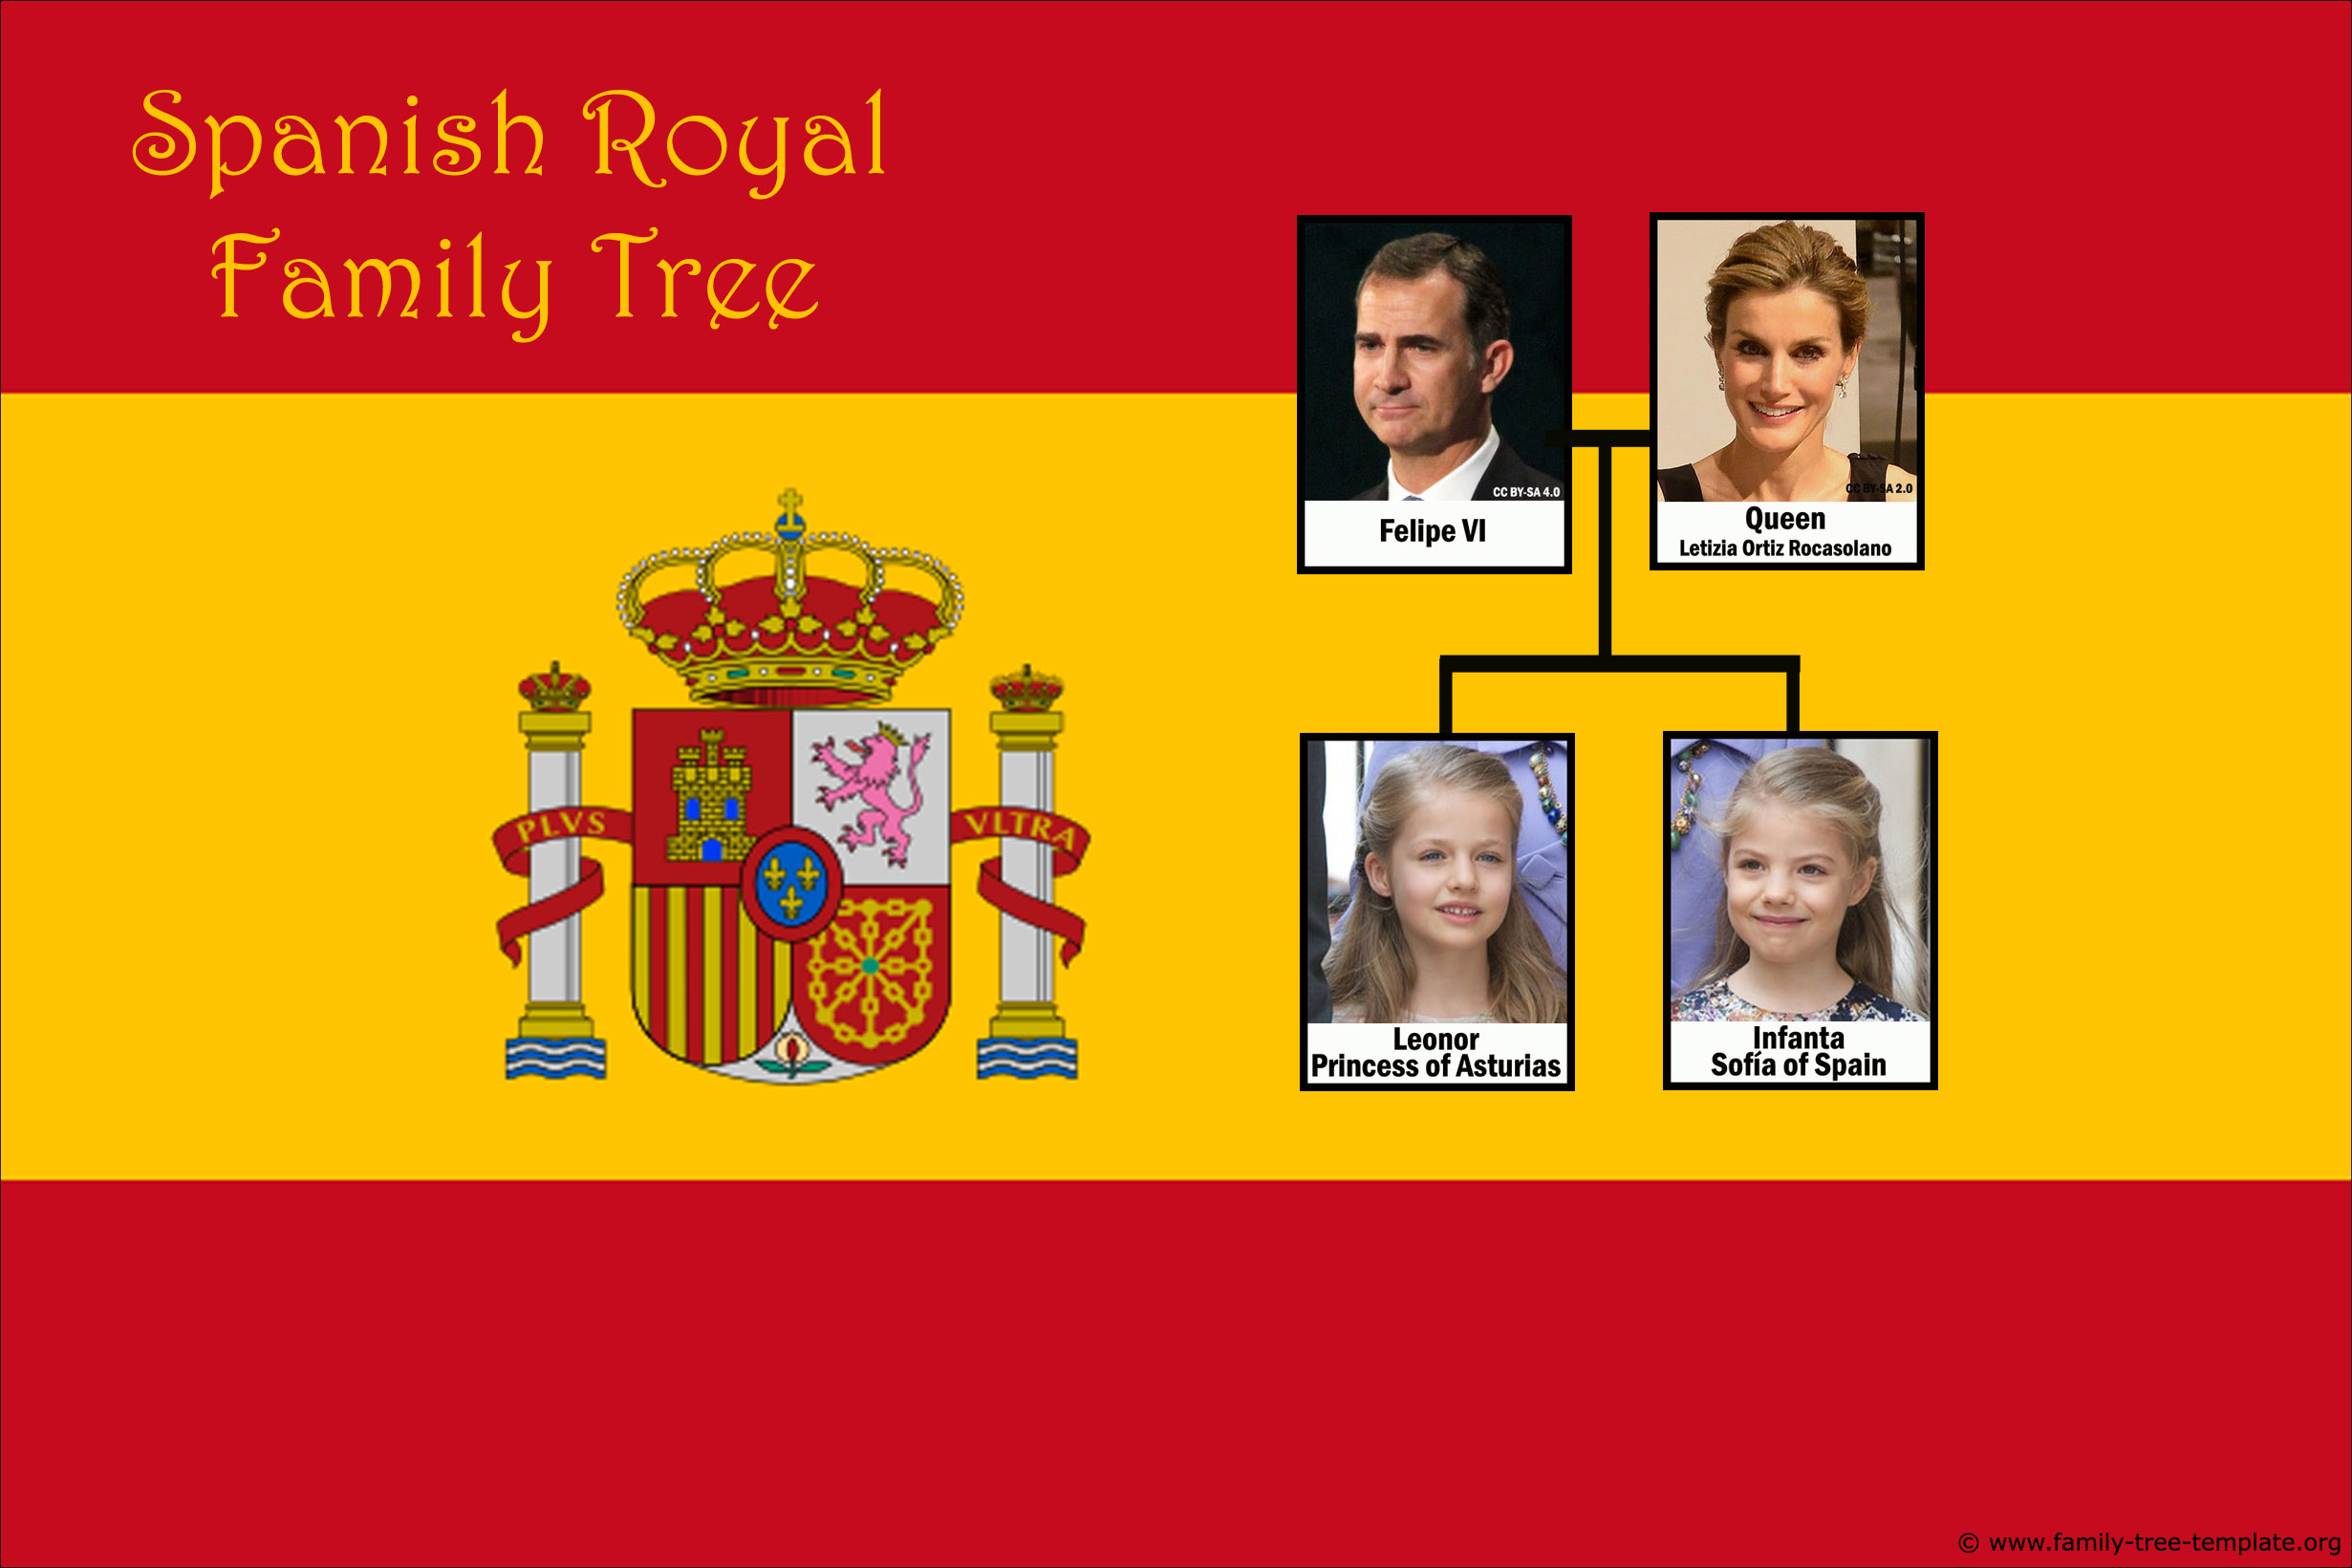 Family tree of royal Spanish King Felipe VI.